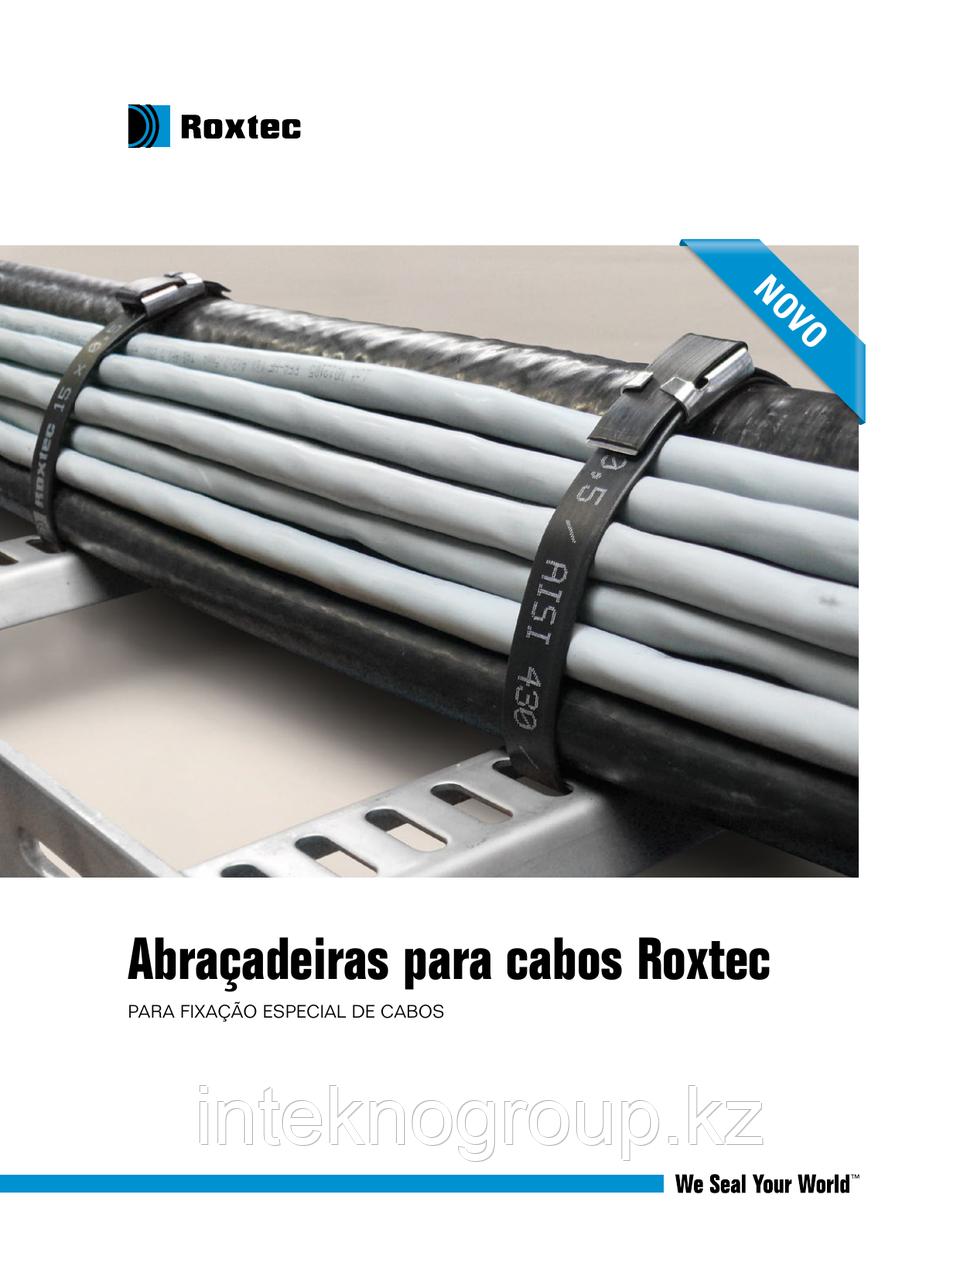 Roxtec Cable straps Strap 08x0,3 black/ss. L=400 mm